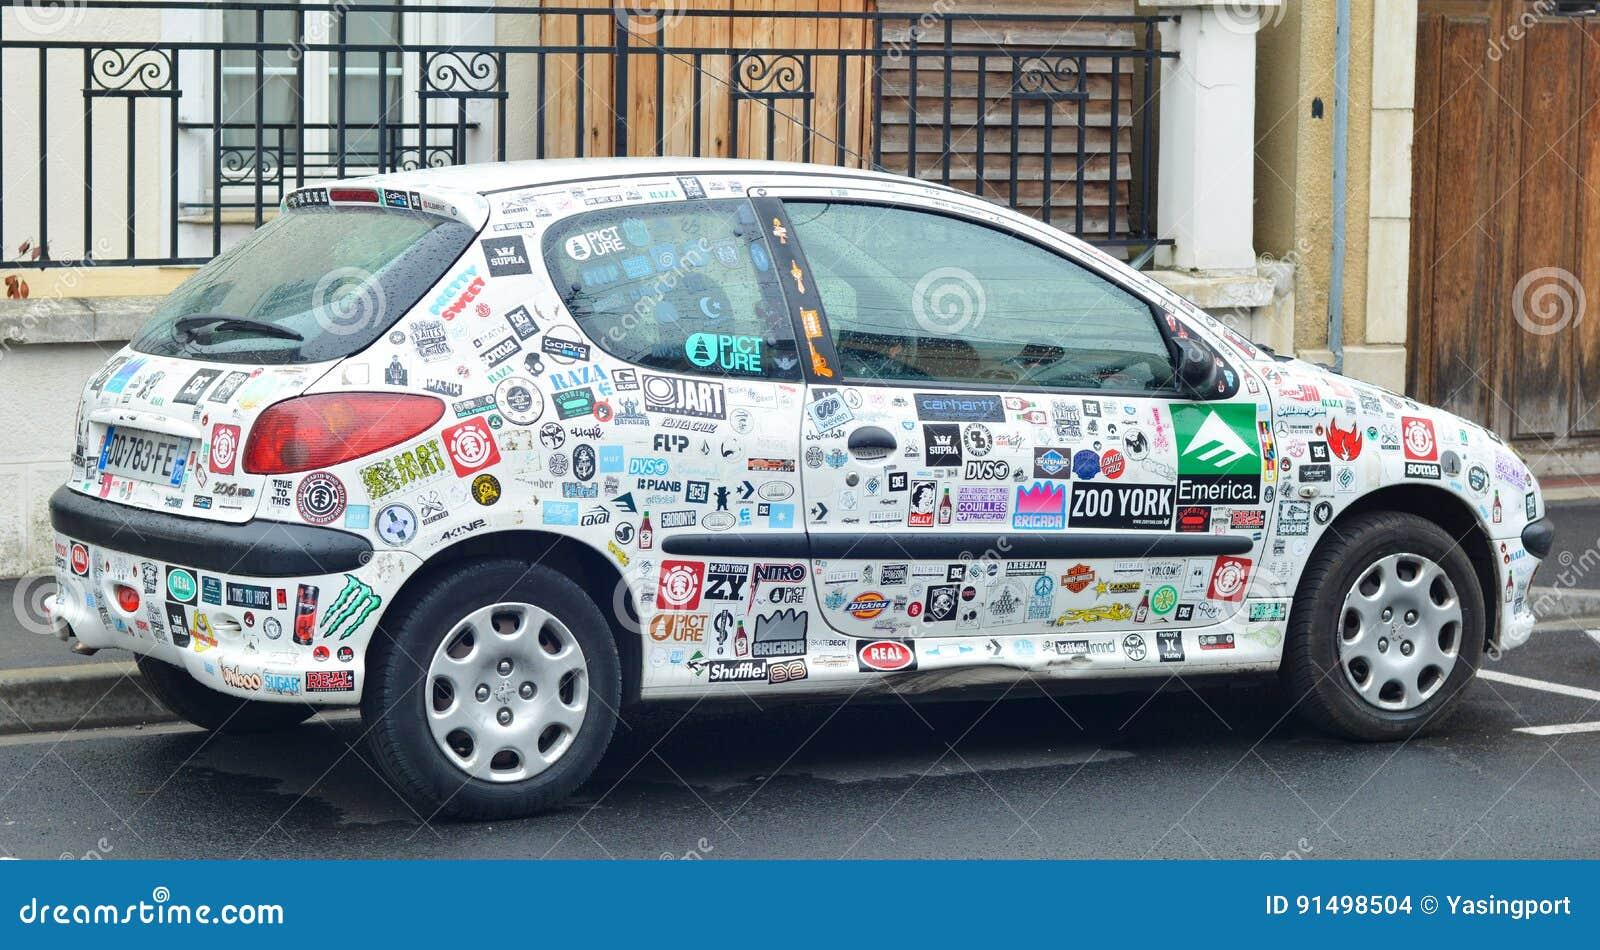 LE MANS, FRANCIA - 25 de abril de 2017: las etiquetas engomadas del coche cubren un coche blanco Peugeot